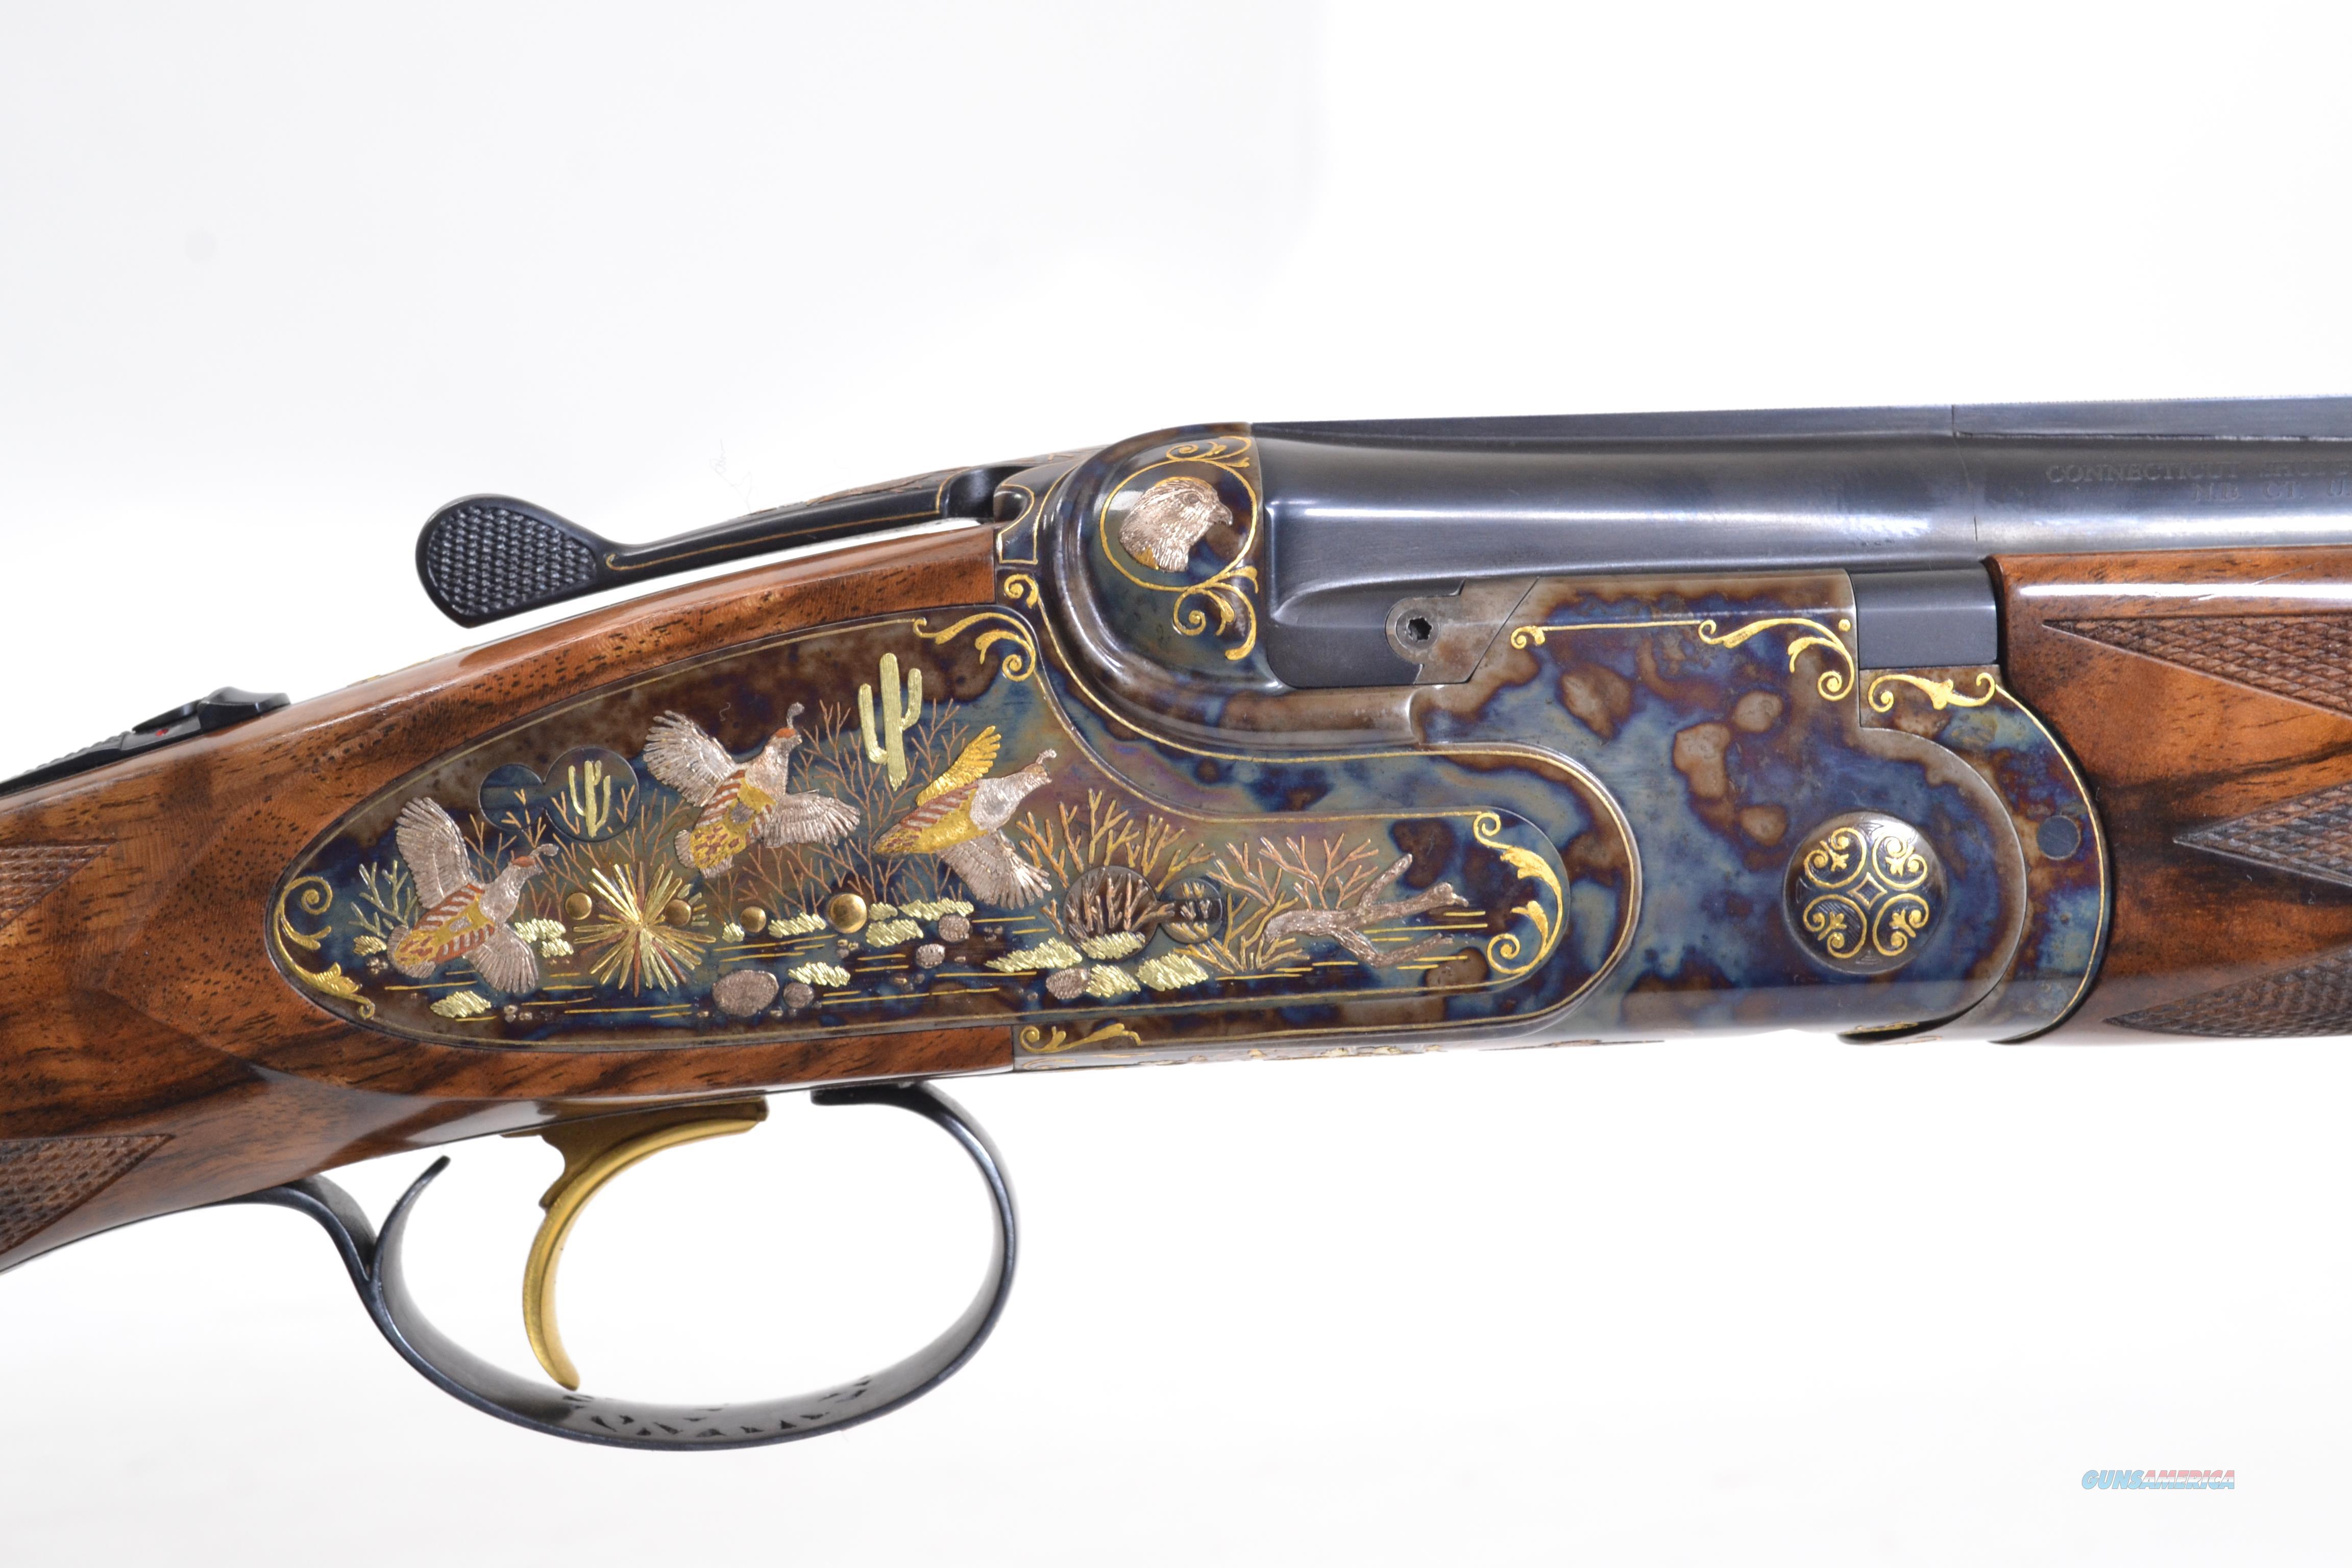 A10 - Gallery, Two Barrel Set, 12ga./20ga.  Guns > Shotguns > Connecticut (Galazan) Shotguns